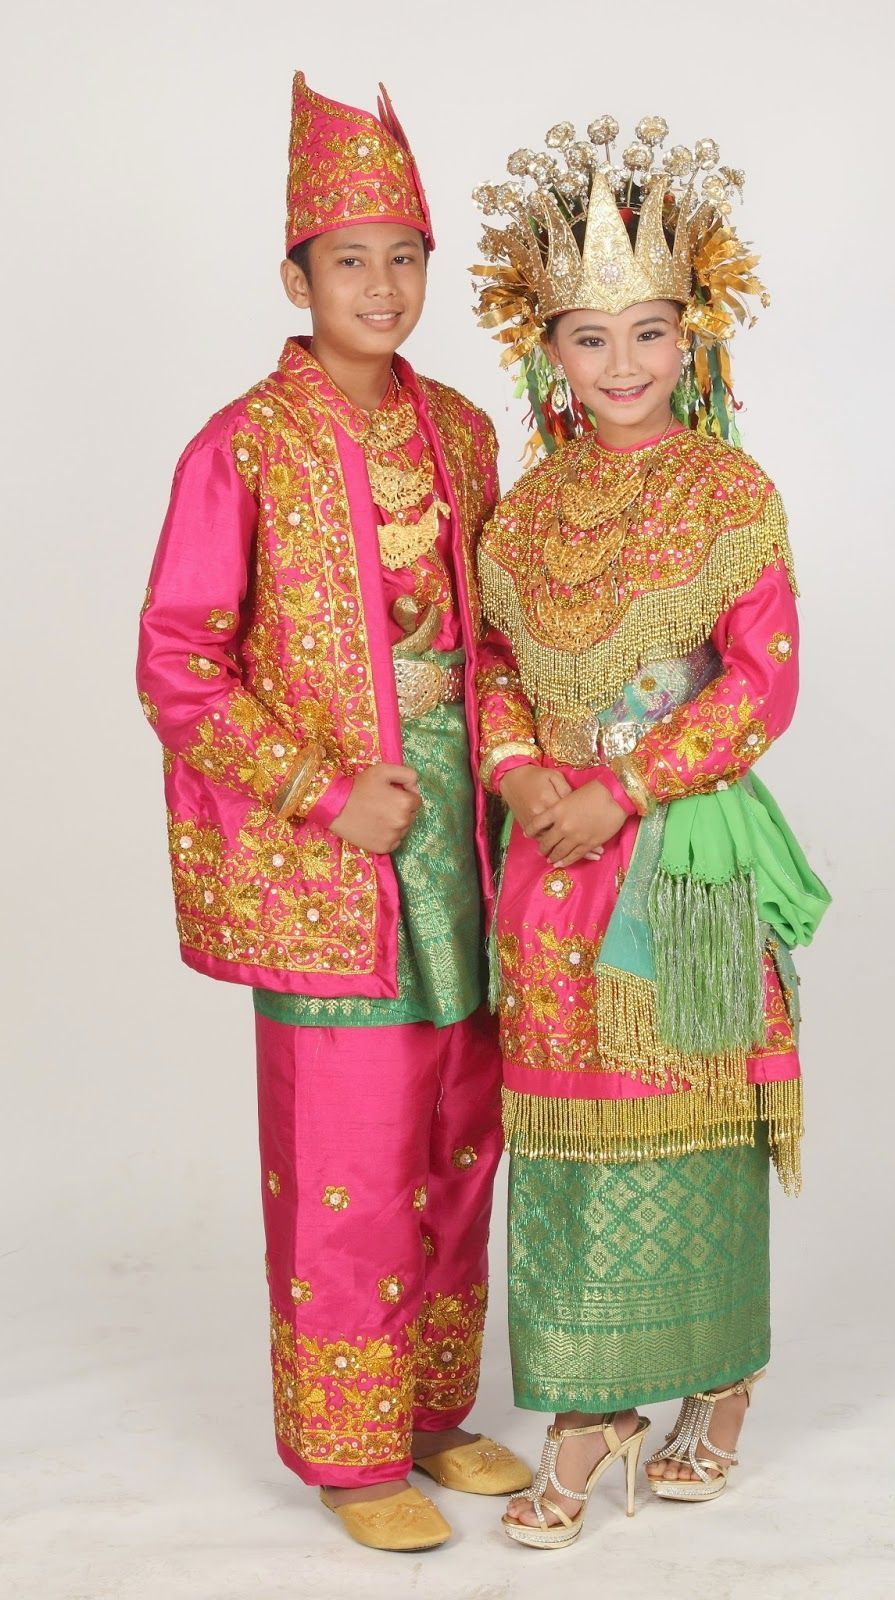 Pakaian Adat Nusantara 33 Provinsi